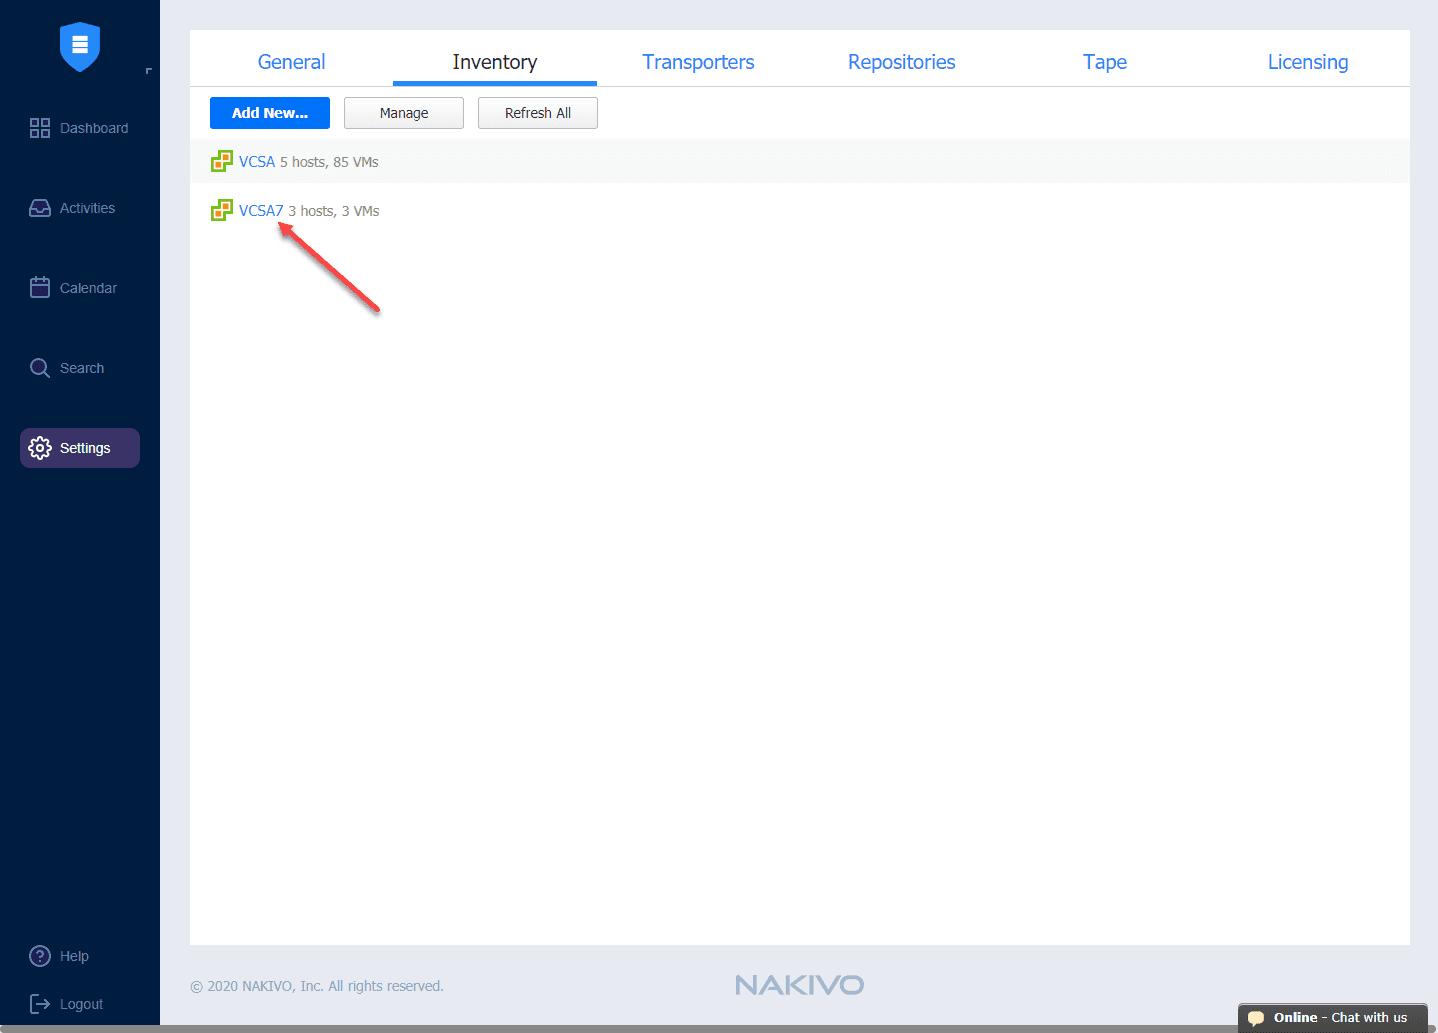 Successfully-adding-a-vSphere-7-environment-in-NAKIVO-Backup-Replication-v10